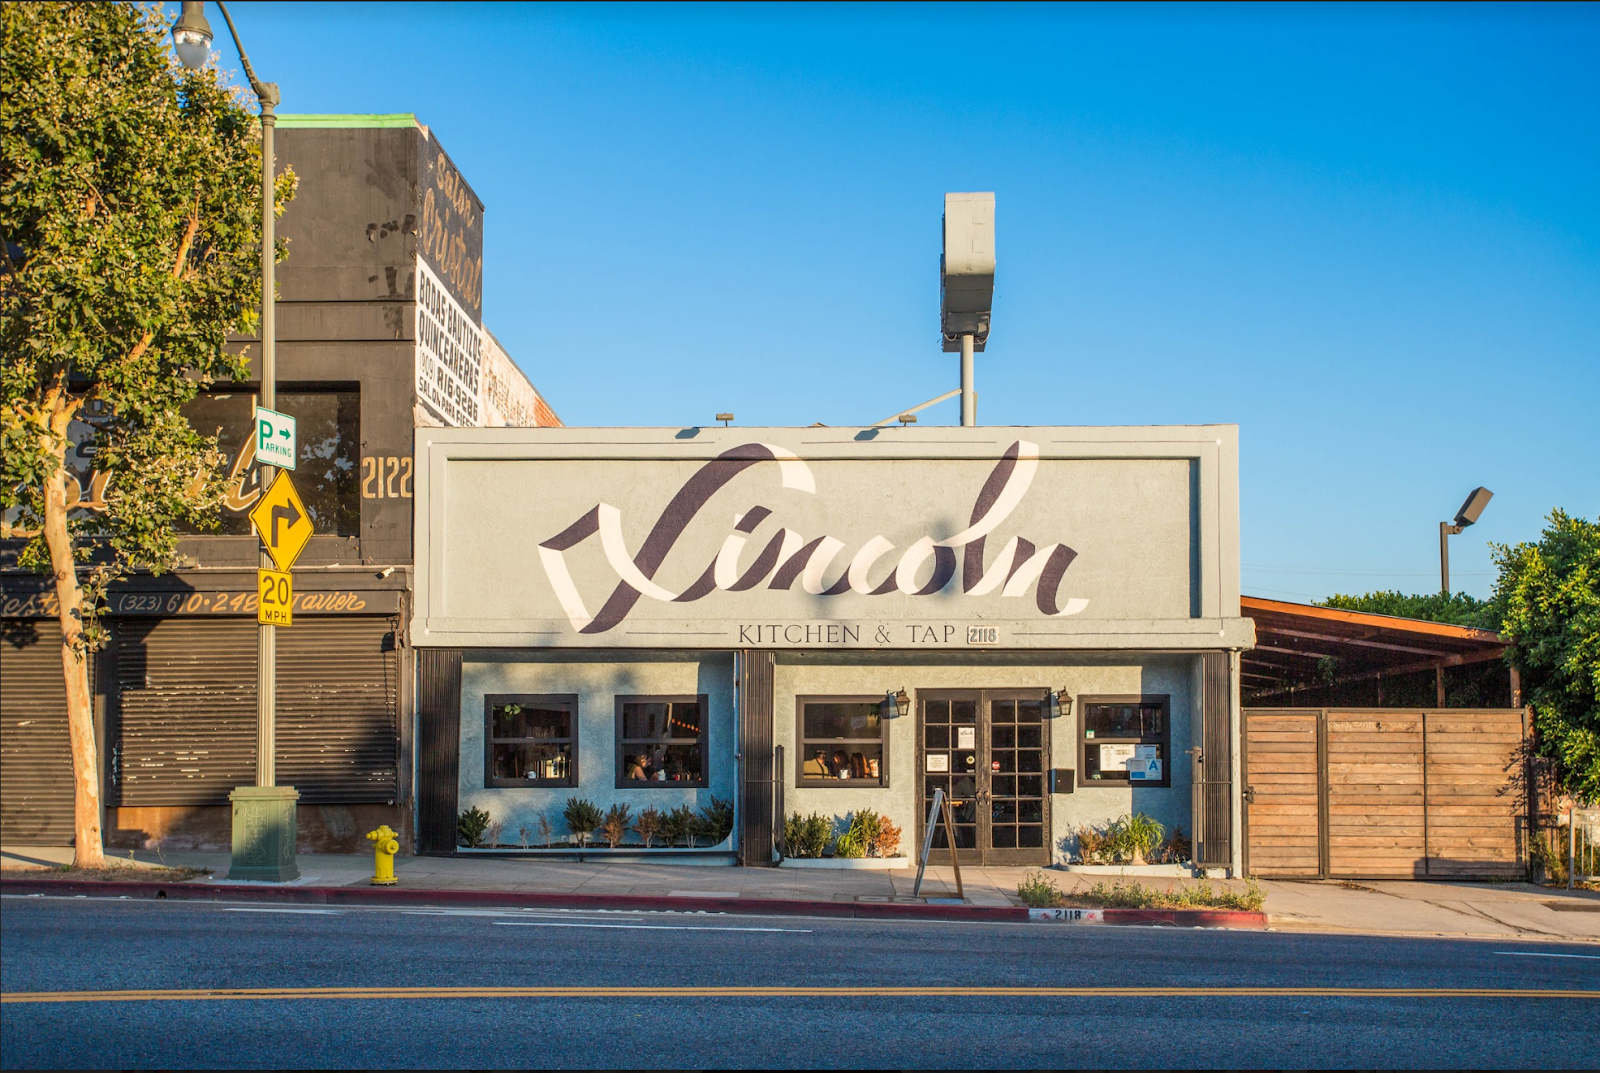 Lincoln Kitchen & Tap